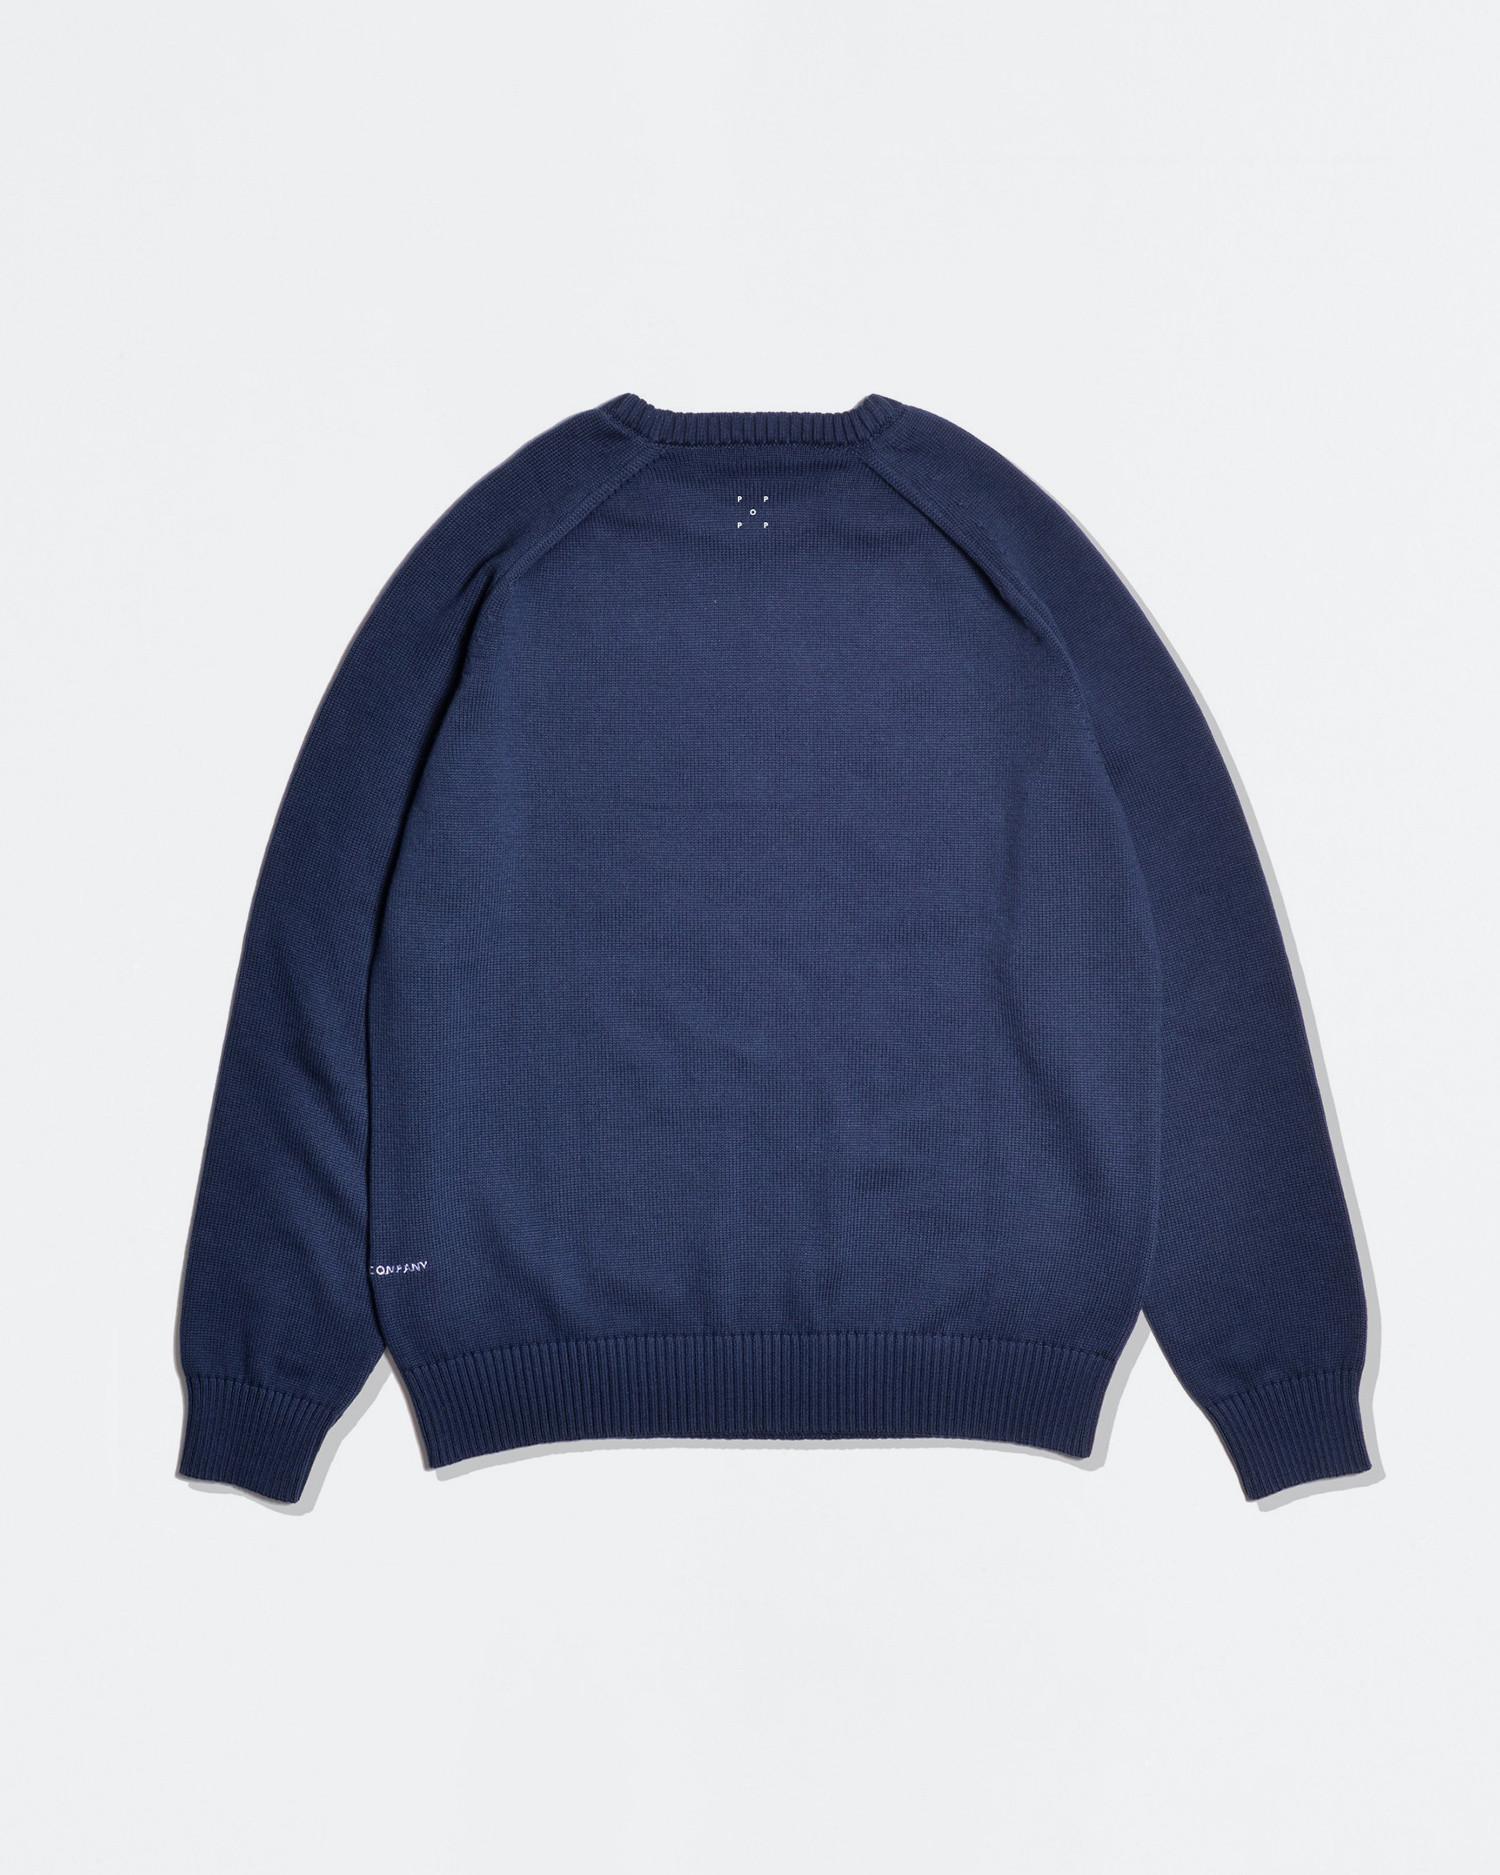 Pop Trading Co X Popeye knit navy